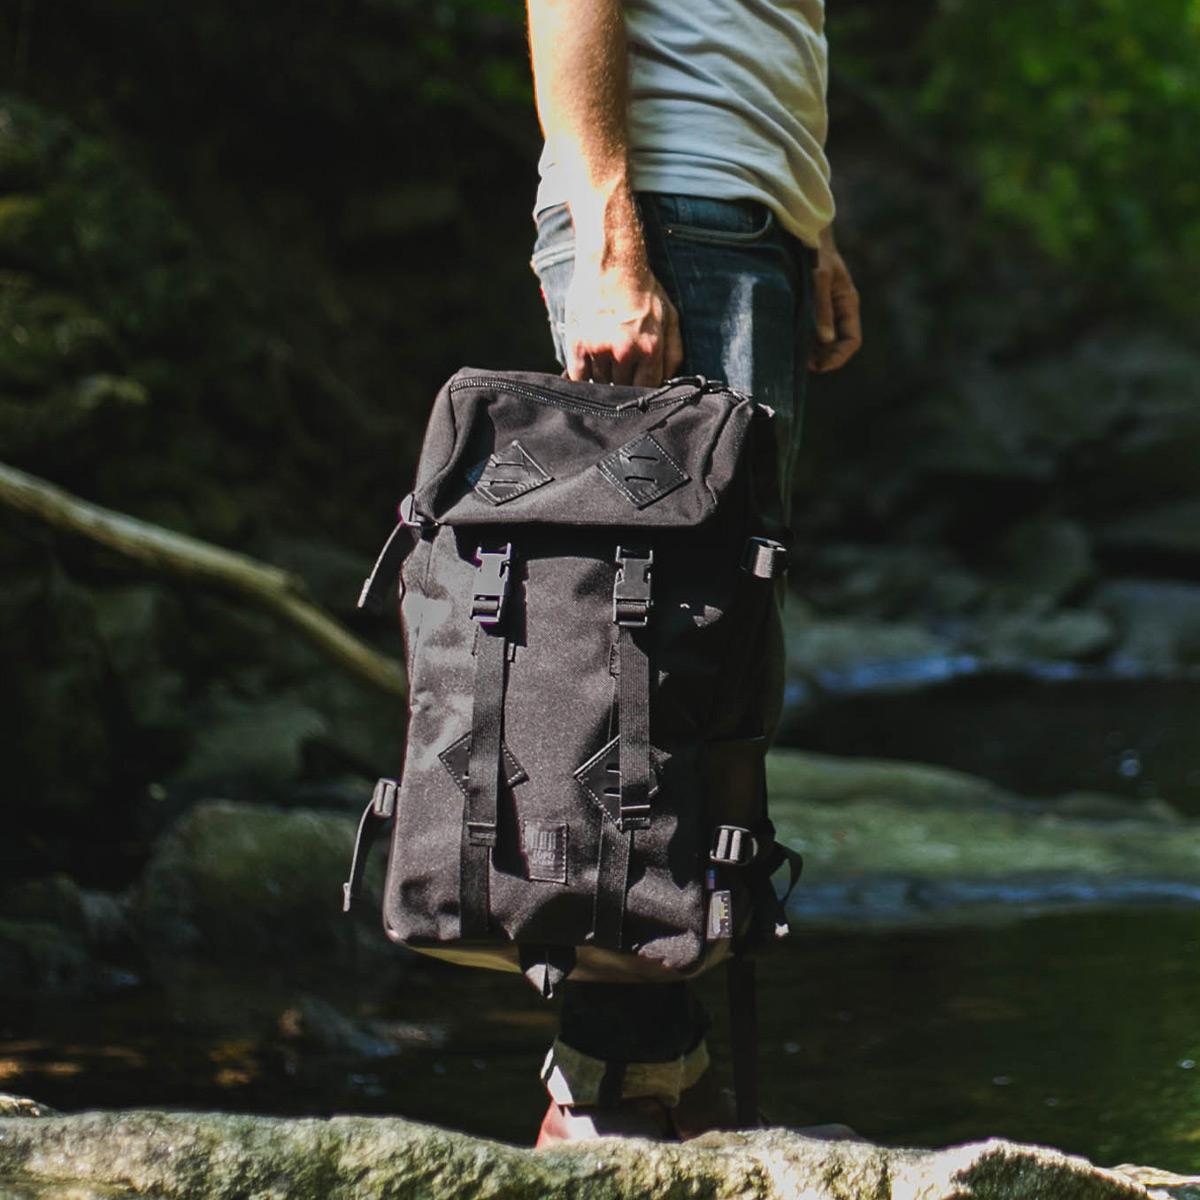 Topo Designs Klettersack Ballistic/Black Leather Lifestyle, ballistic backpack for men and women